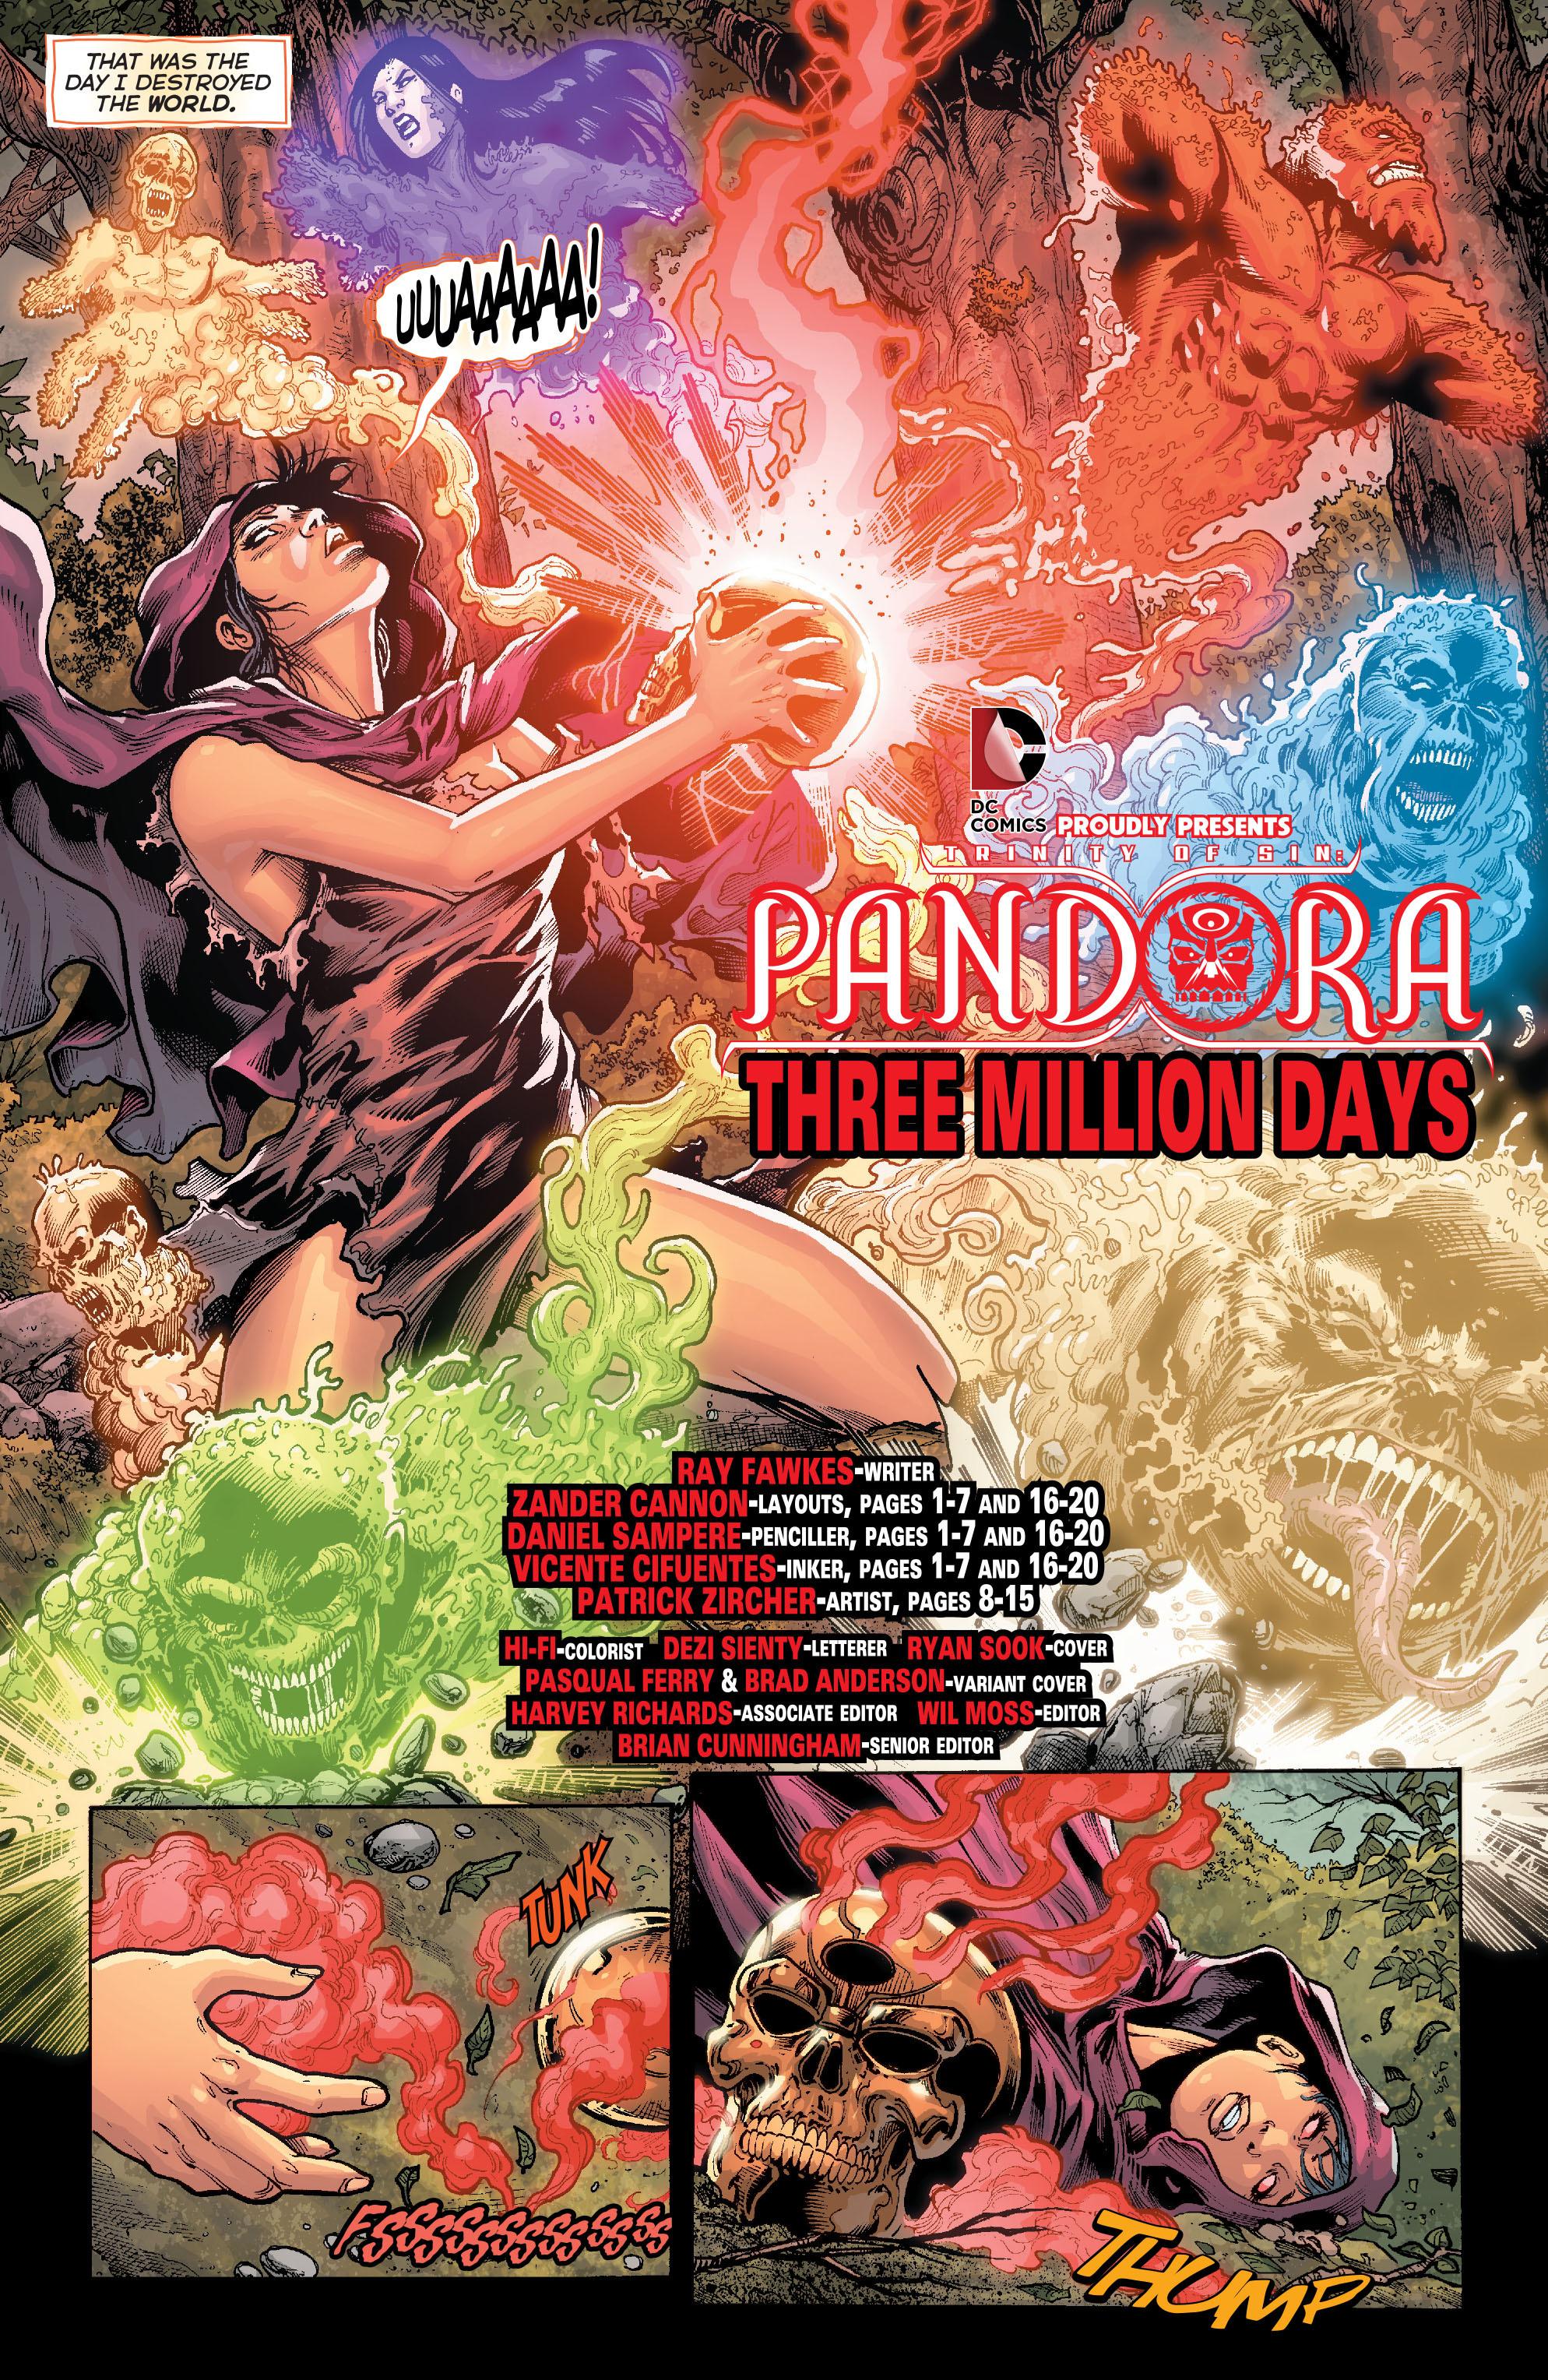 Read online Trinity of Sin: Pandora comic -  Issue #1 - 4